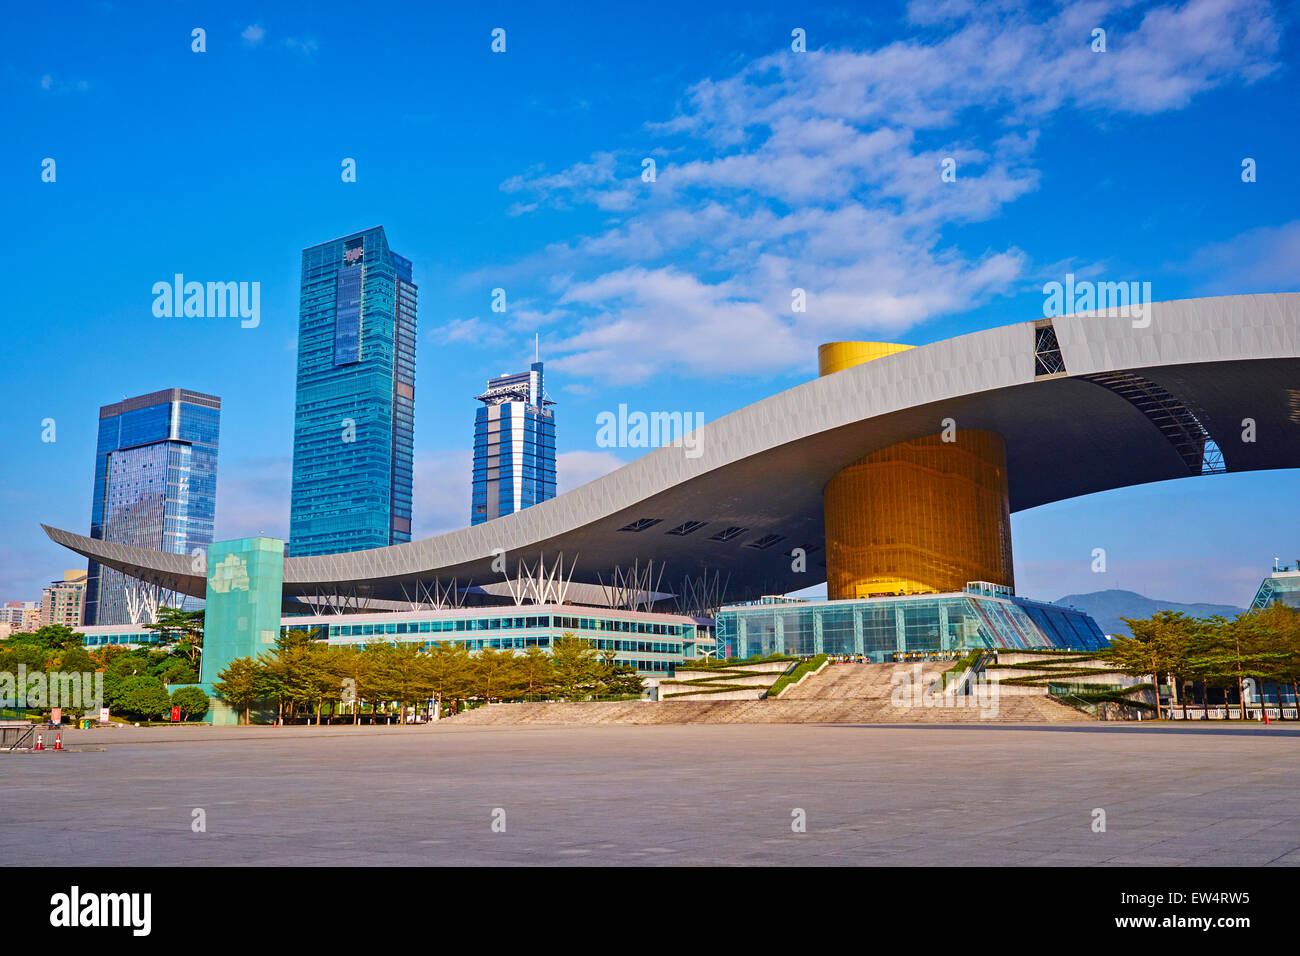 La Chine, la province du Guangdong, Shenzhen, Civic Square ou citoyens Square Photo Stock